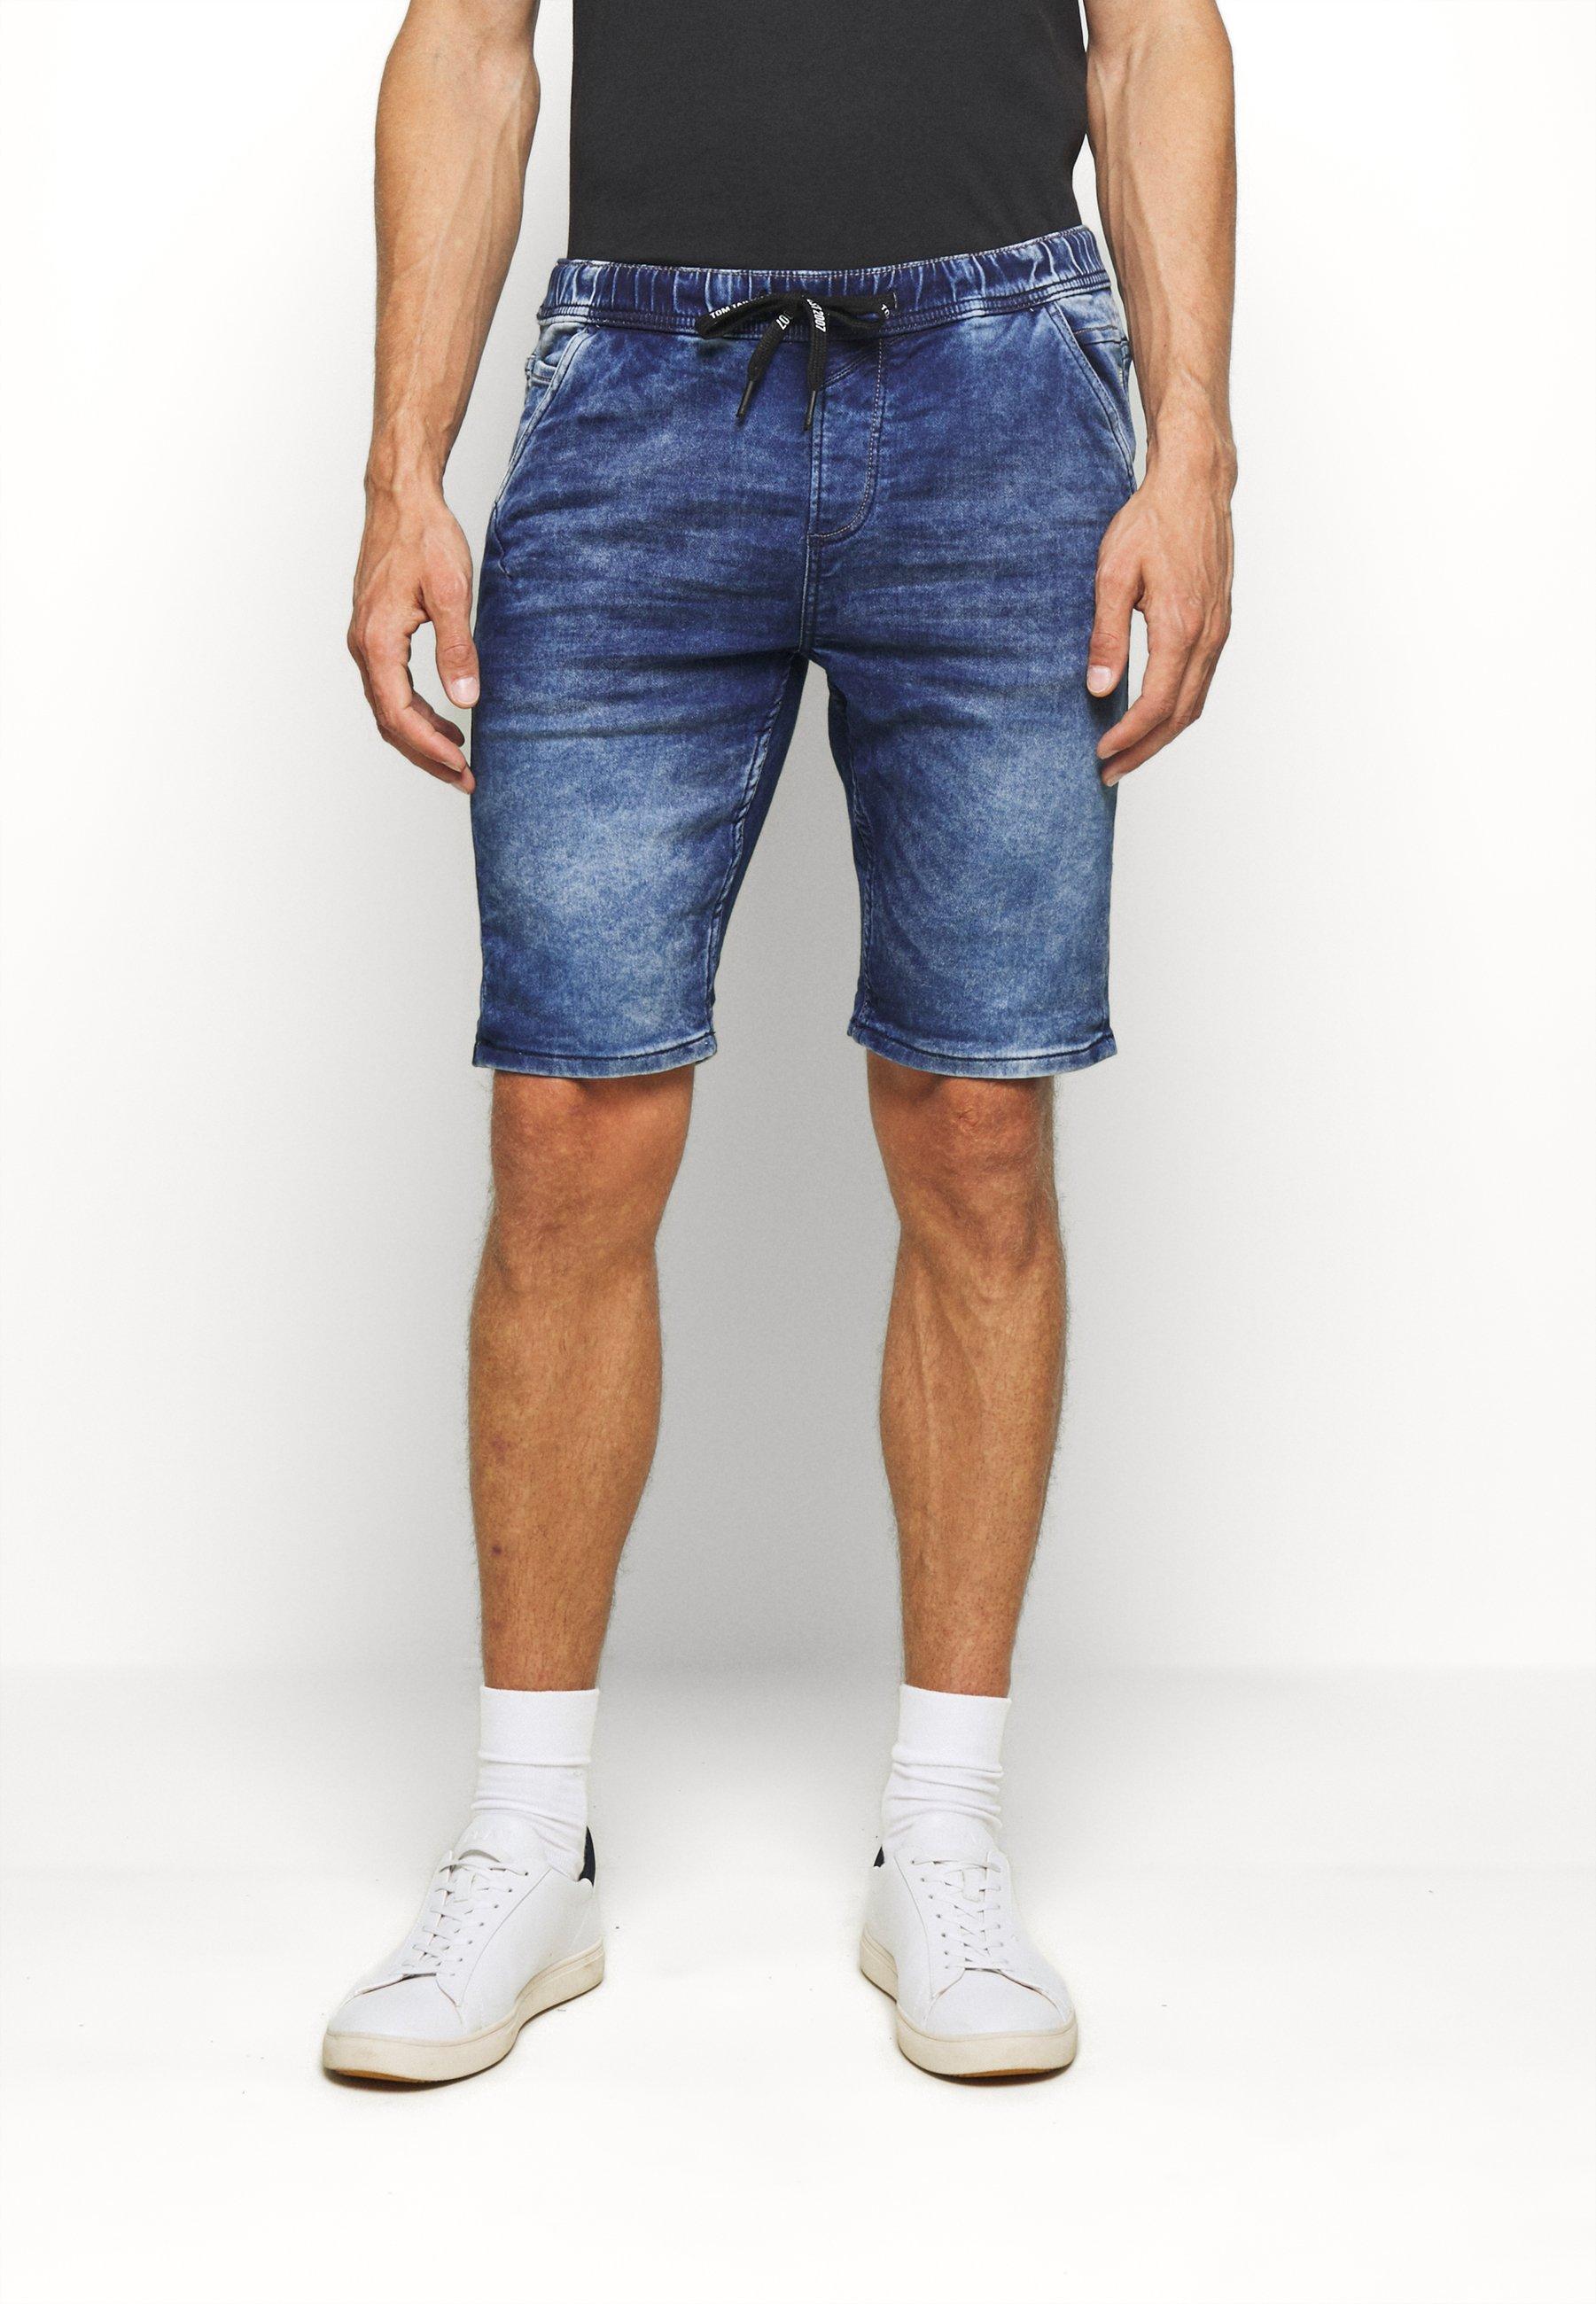 Herren JEANSHOSEN DENIM JOGGER SHORTS - Jeans Shorts